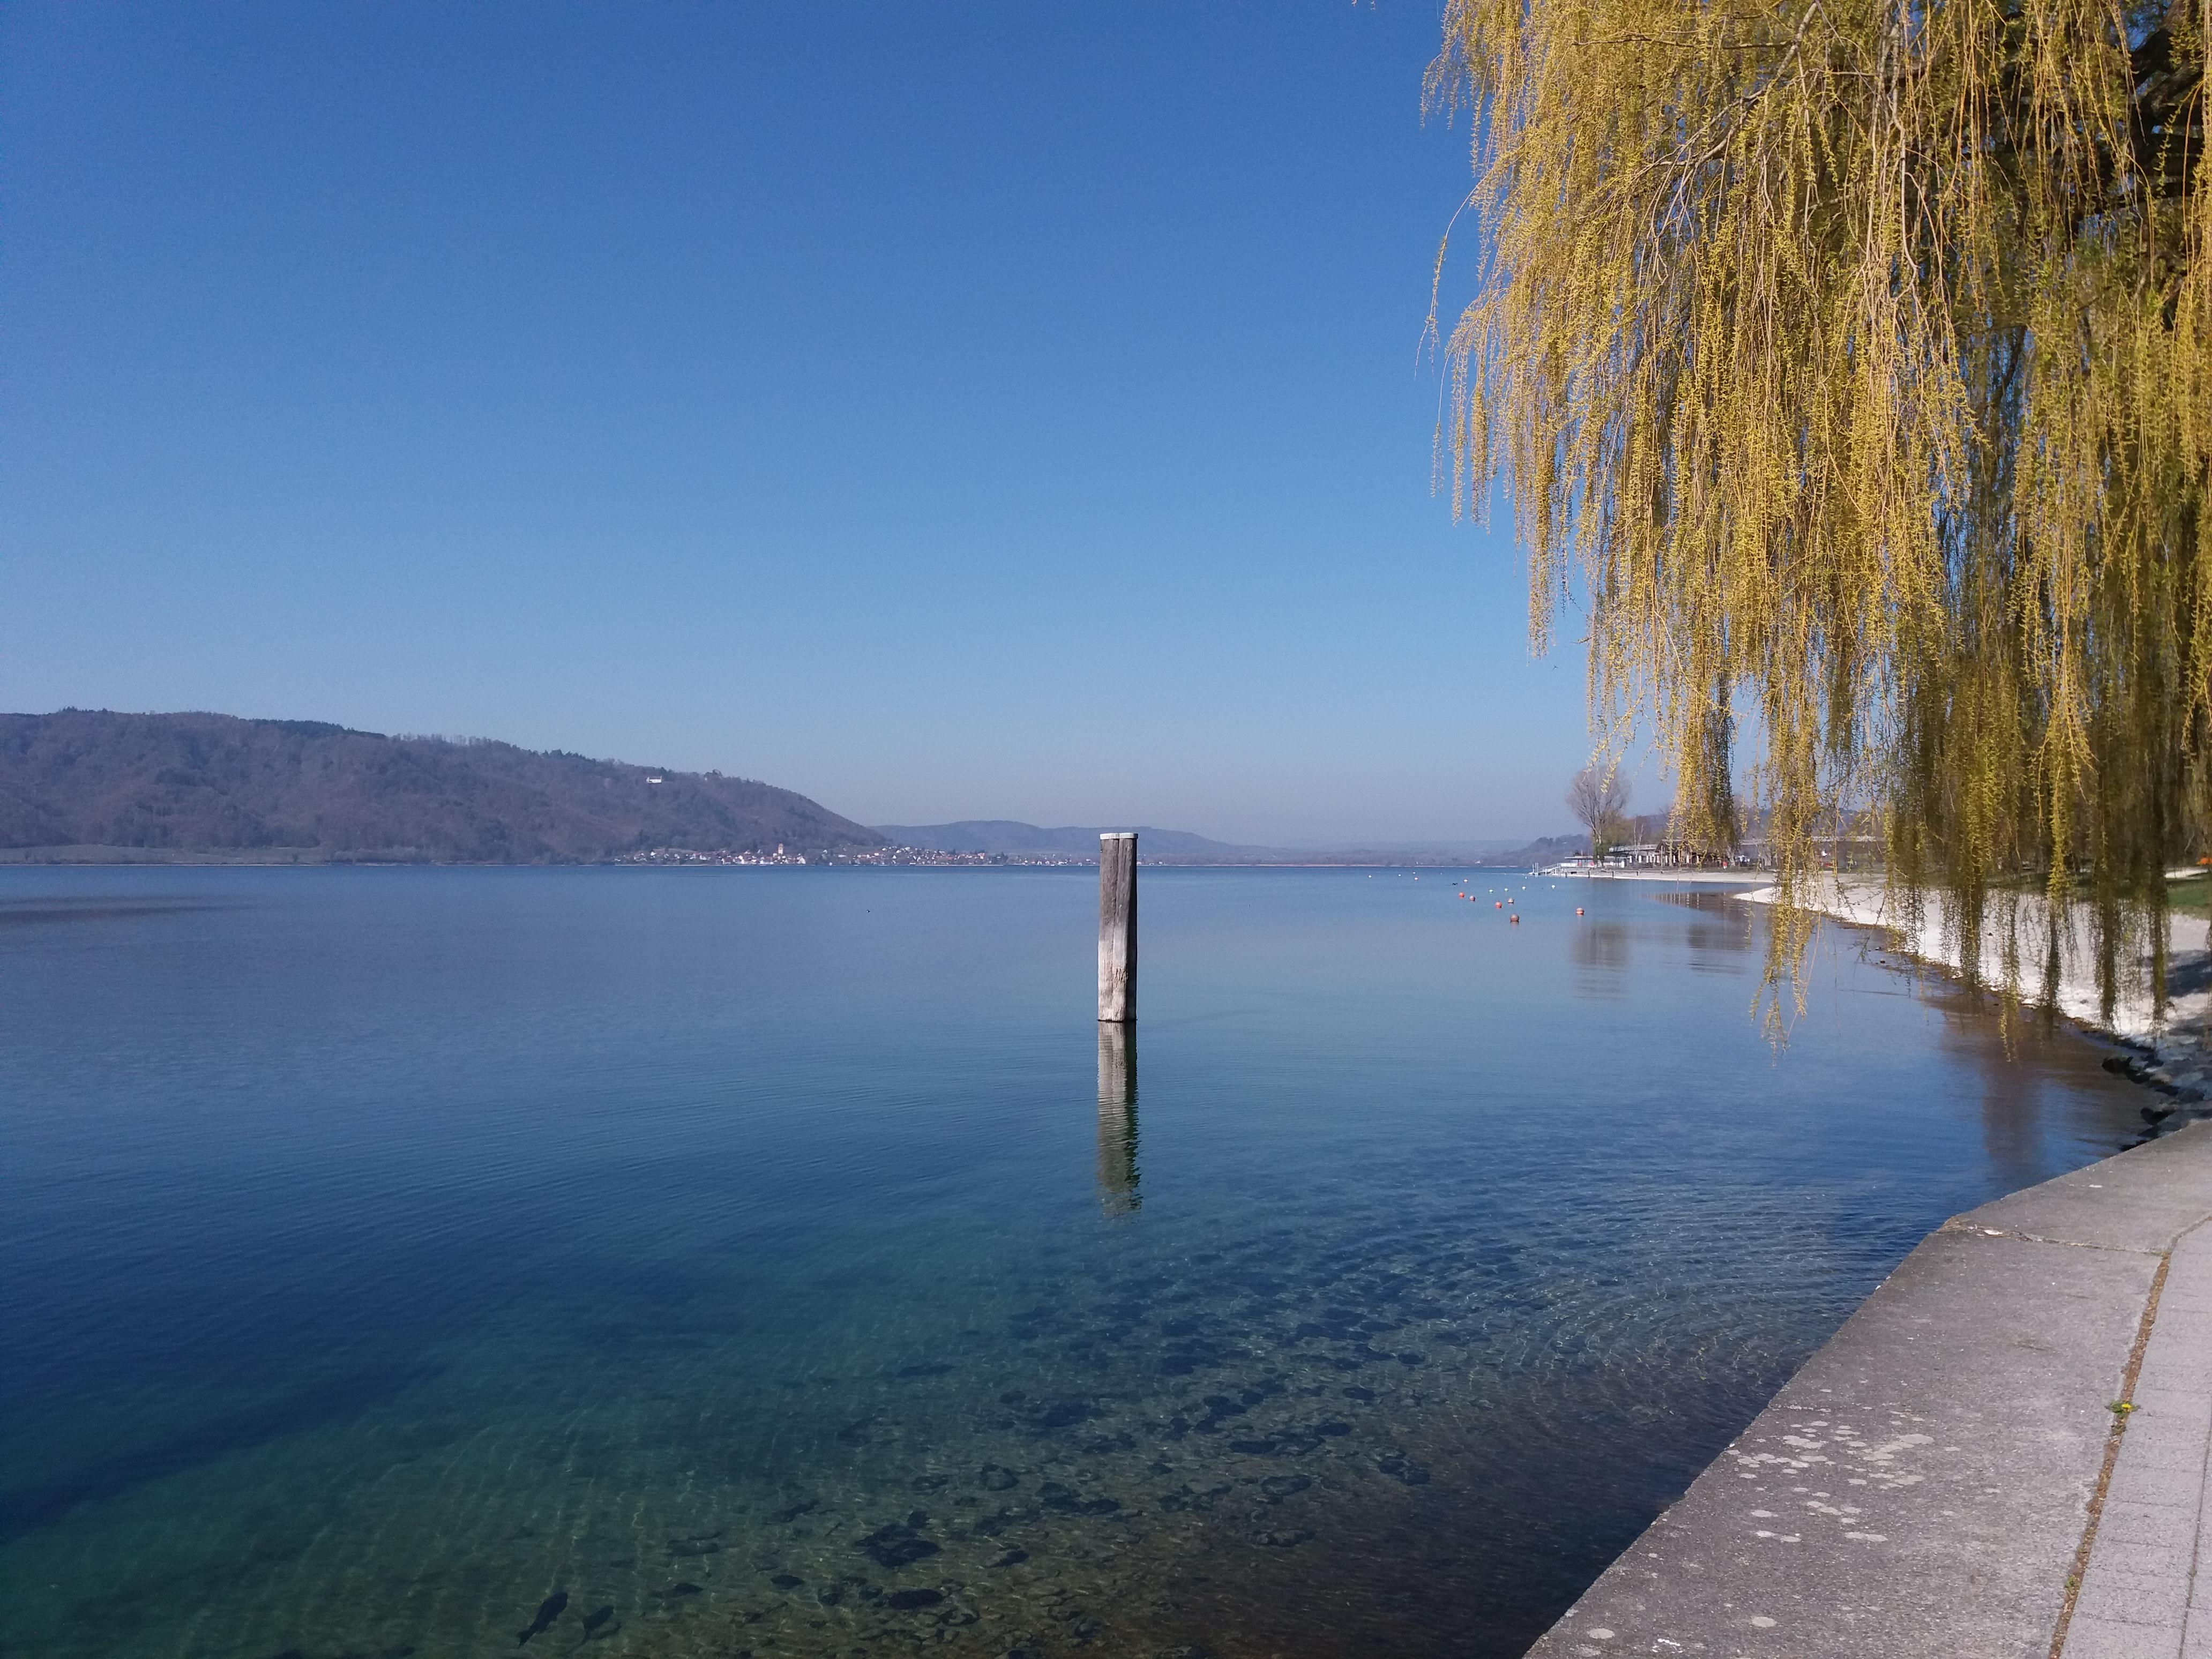 entspannte Momente am See